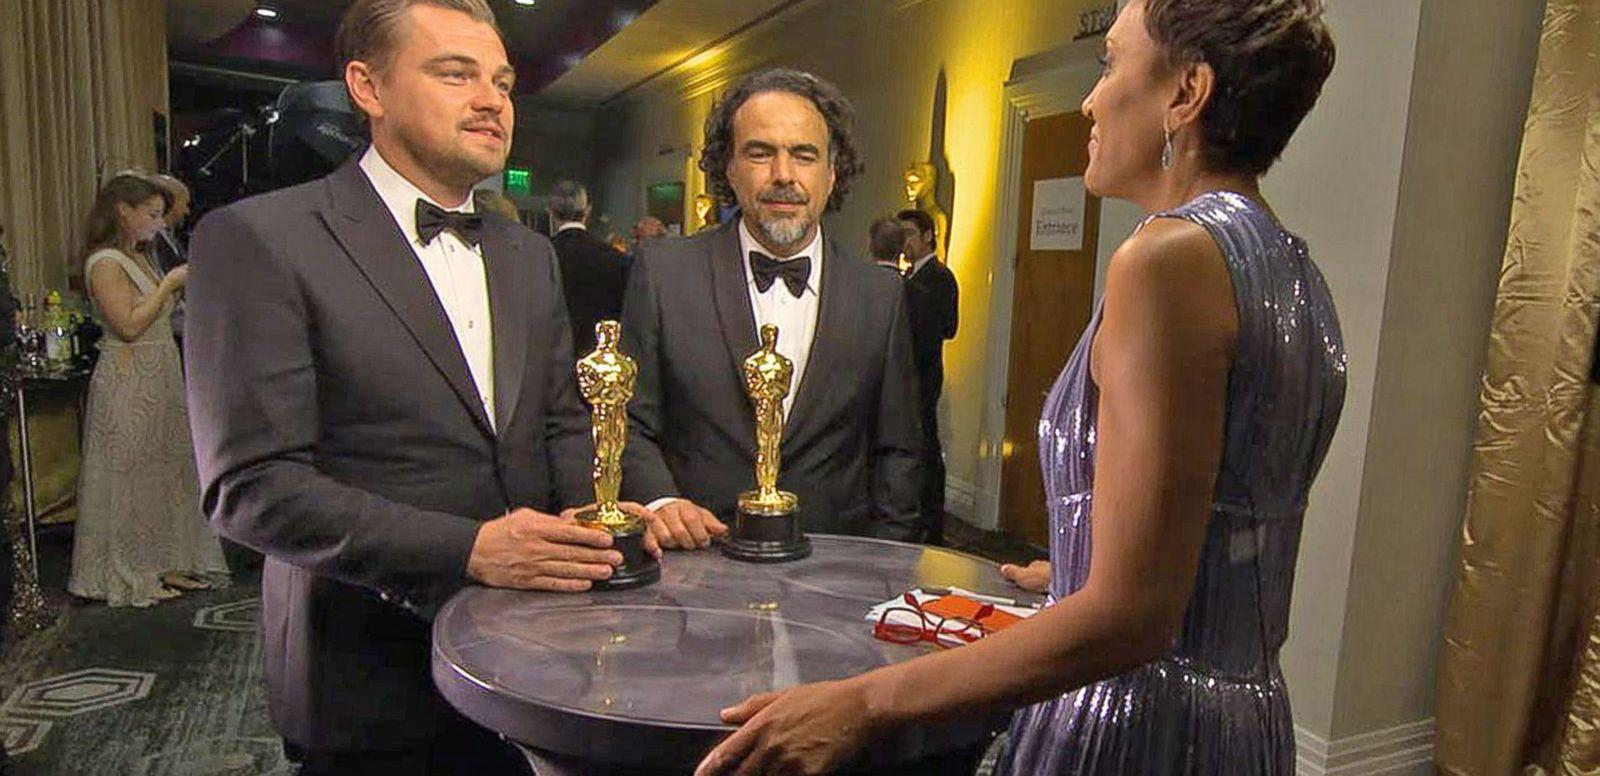 VIDEO: 2016 Oscars: Leonardo DiCaprio and More Stars Dish on Oscar Wins